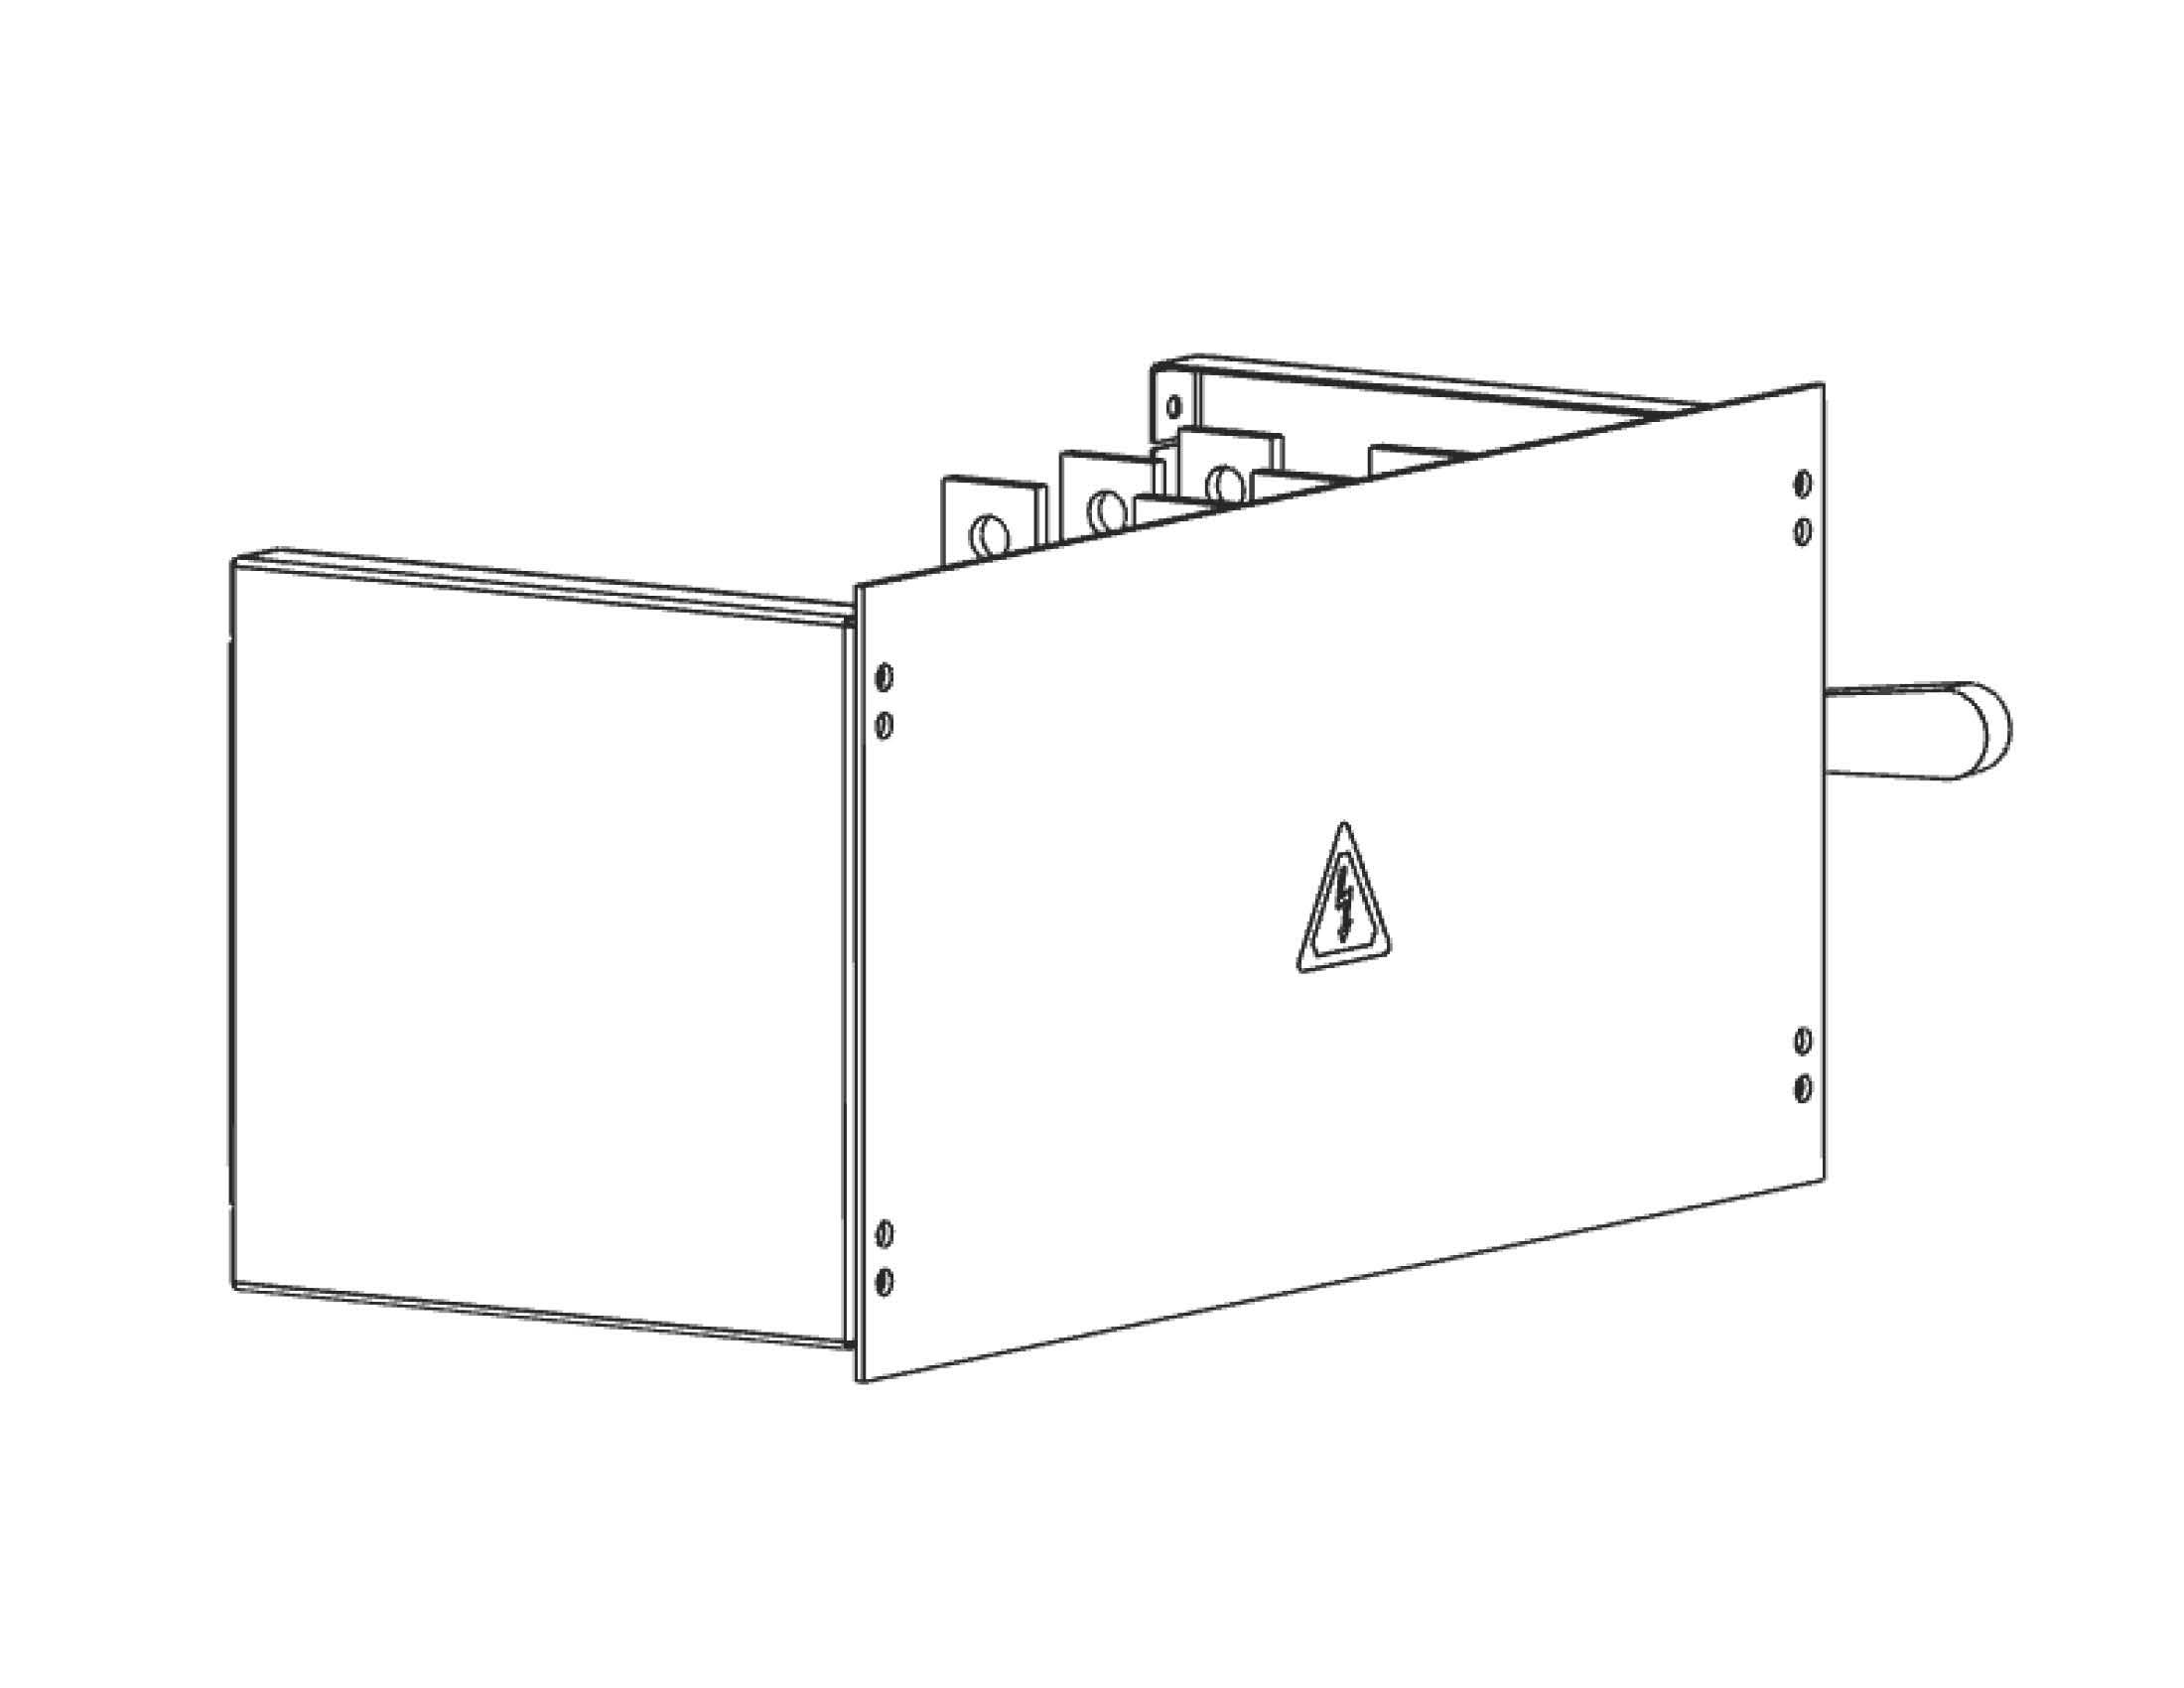 Экран для кожуха рубильника для ВРУ Unit шириной 600ммEKF PROxima